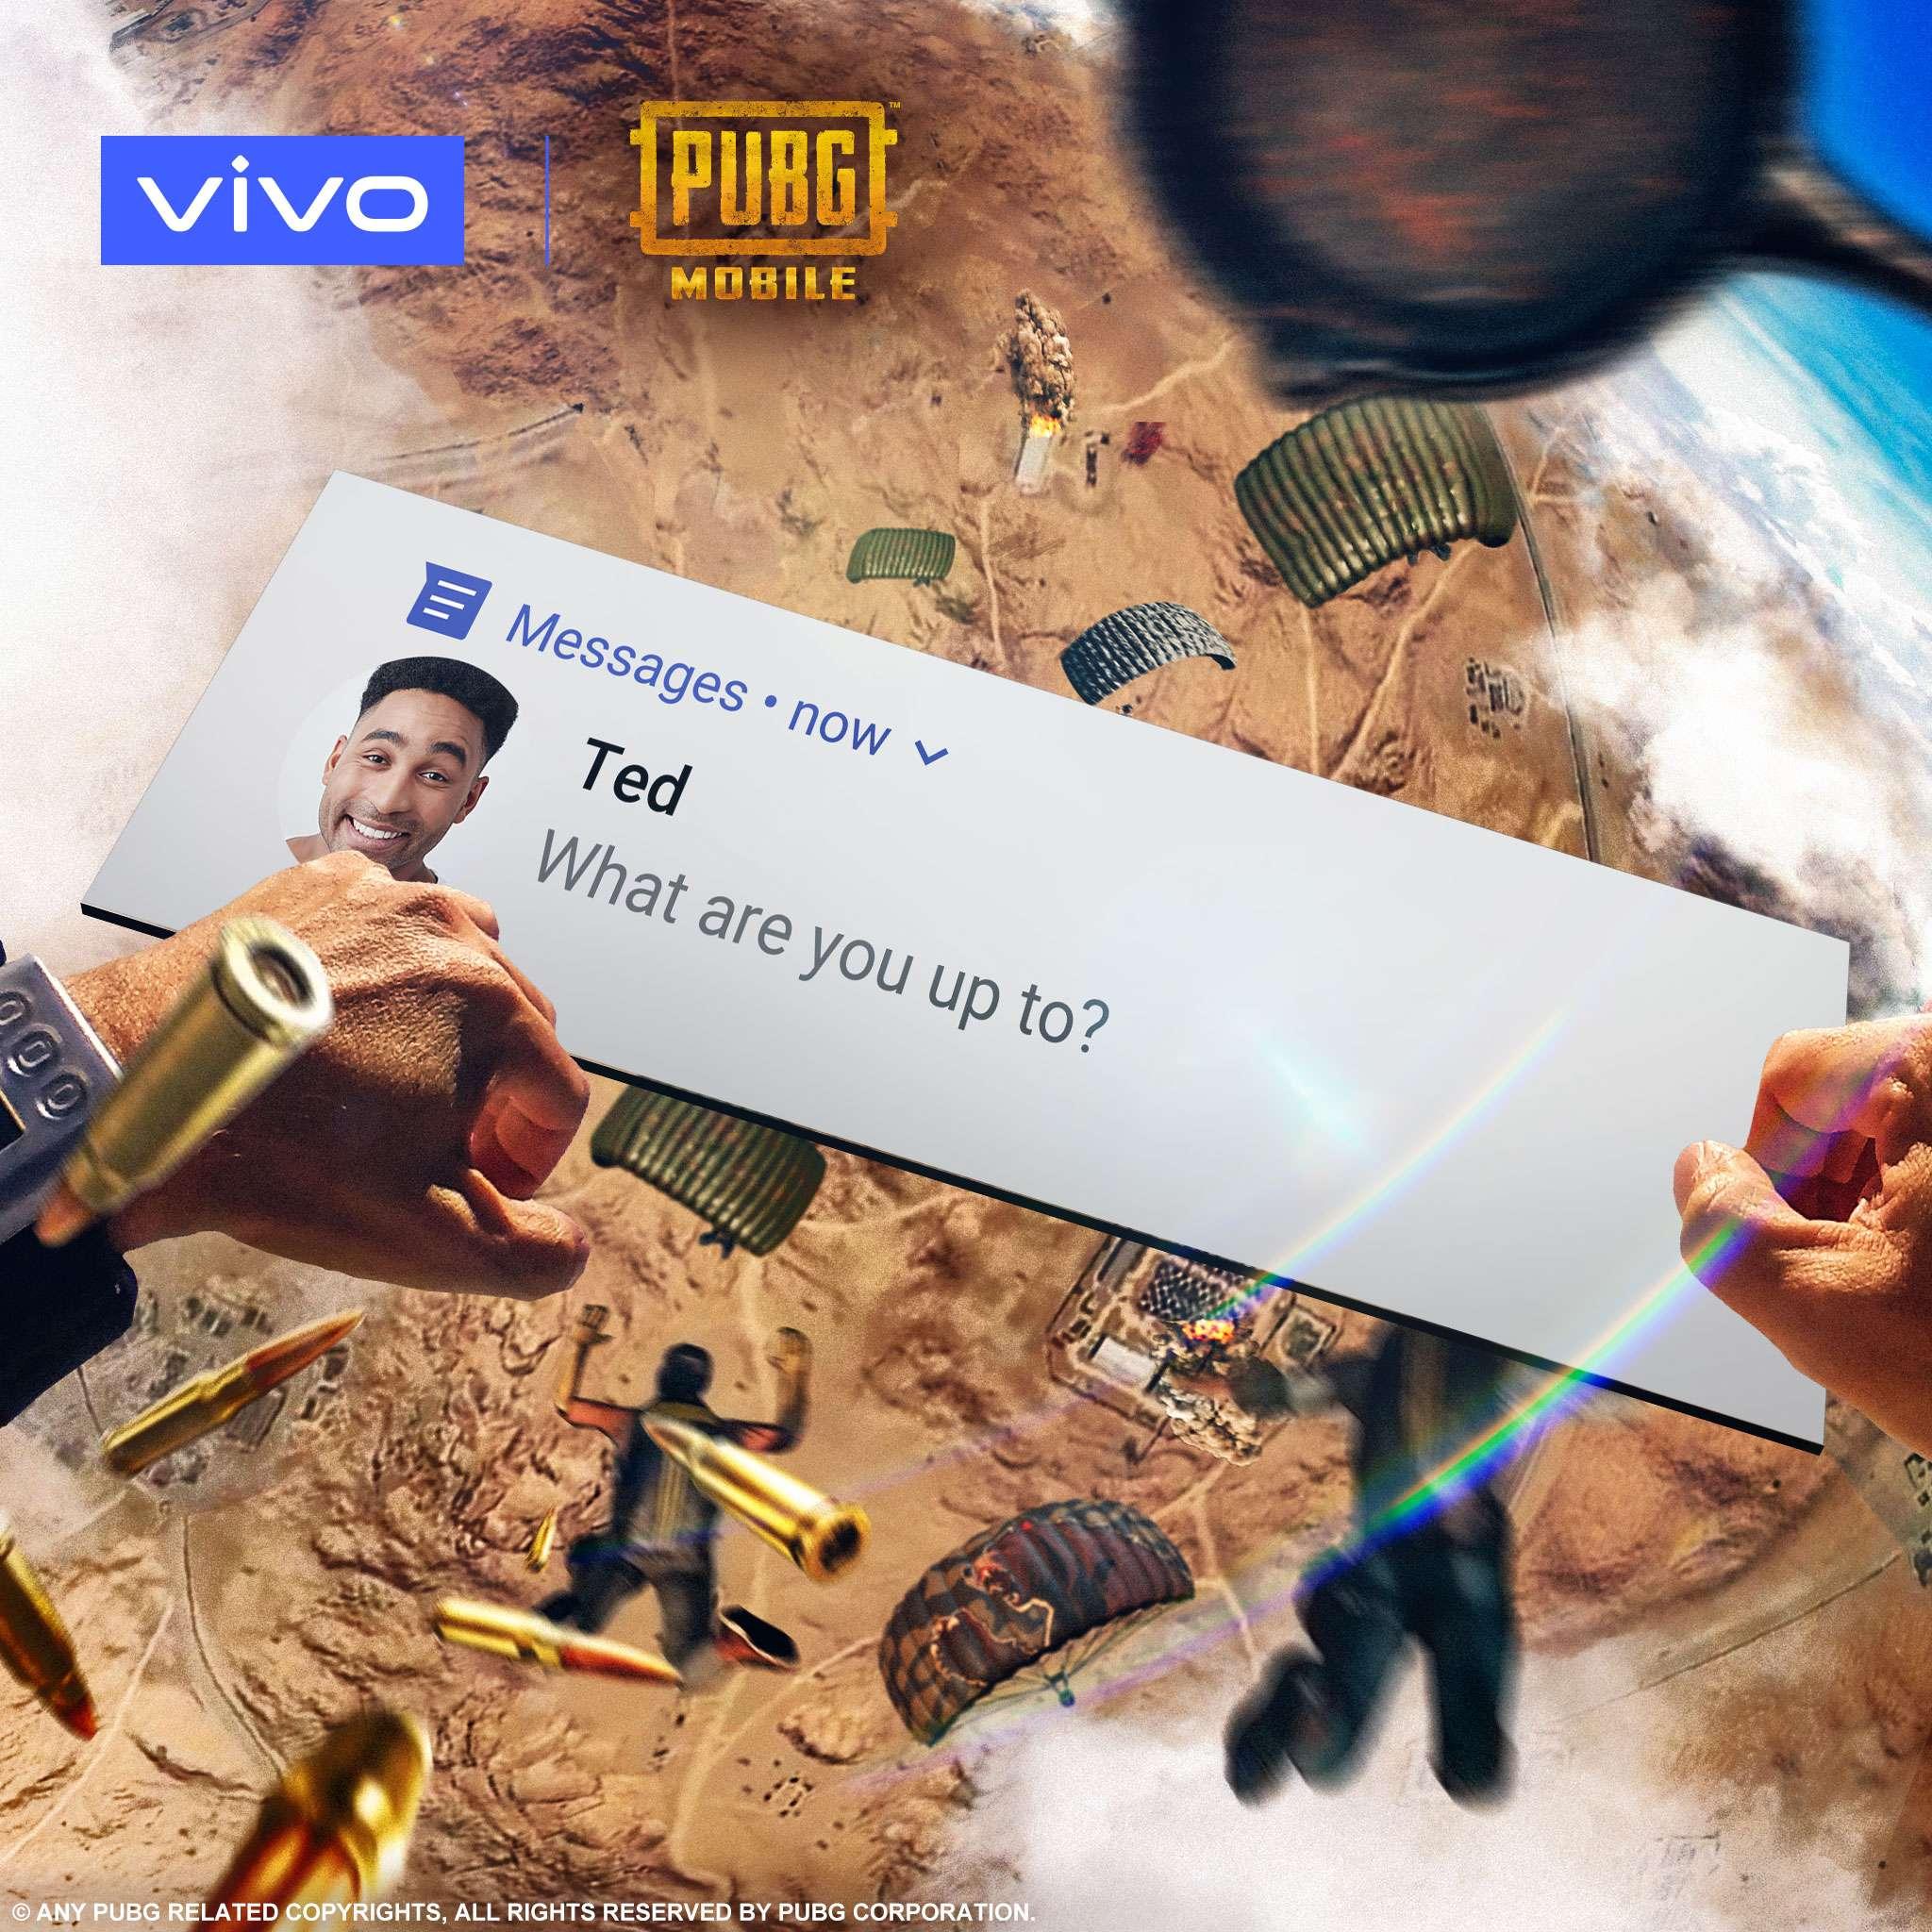 Vivo_socialPost_PUBG_Parachute